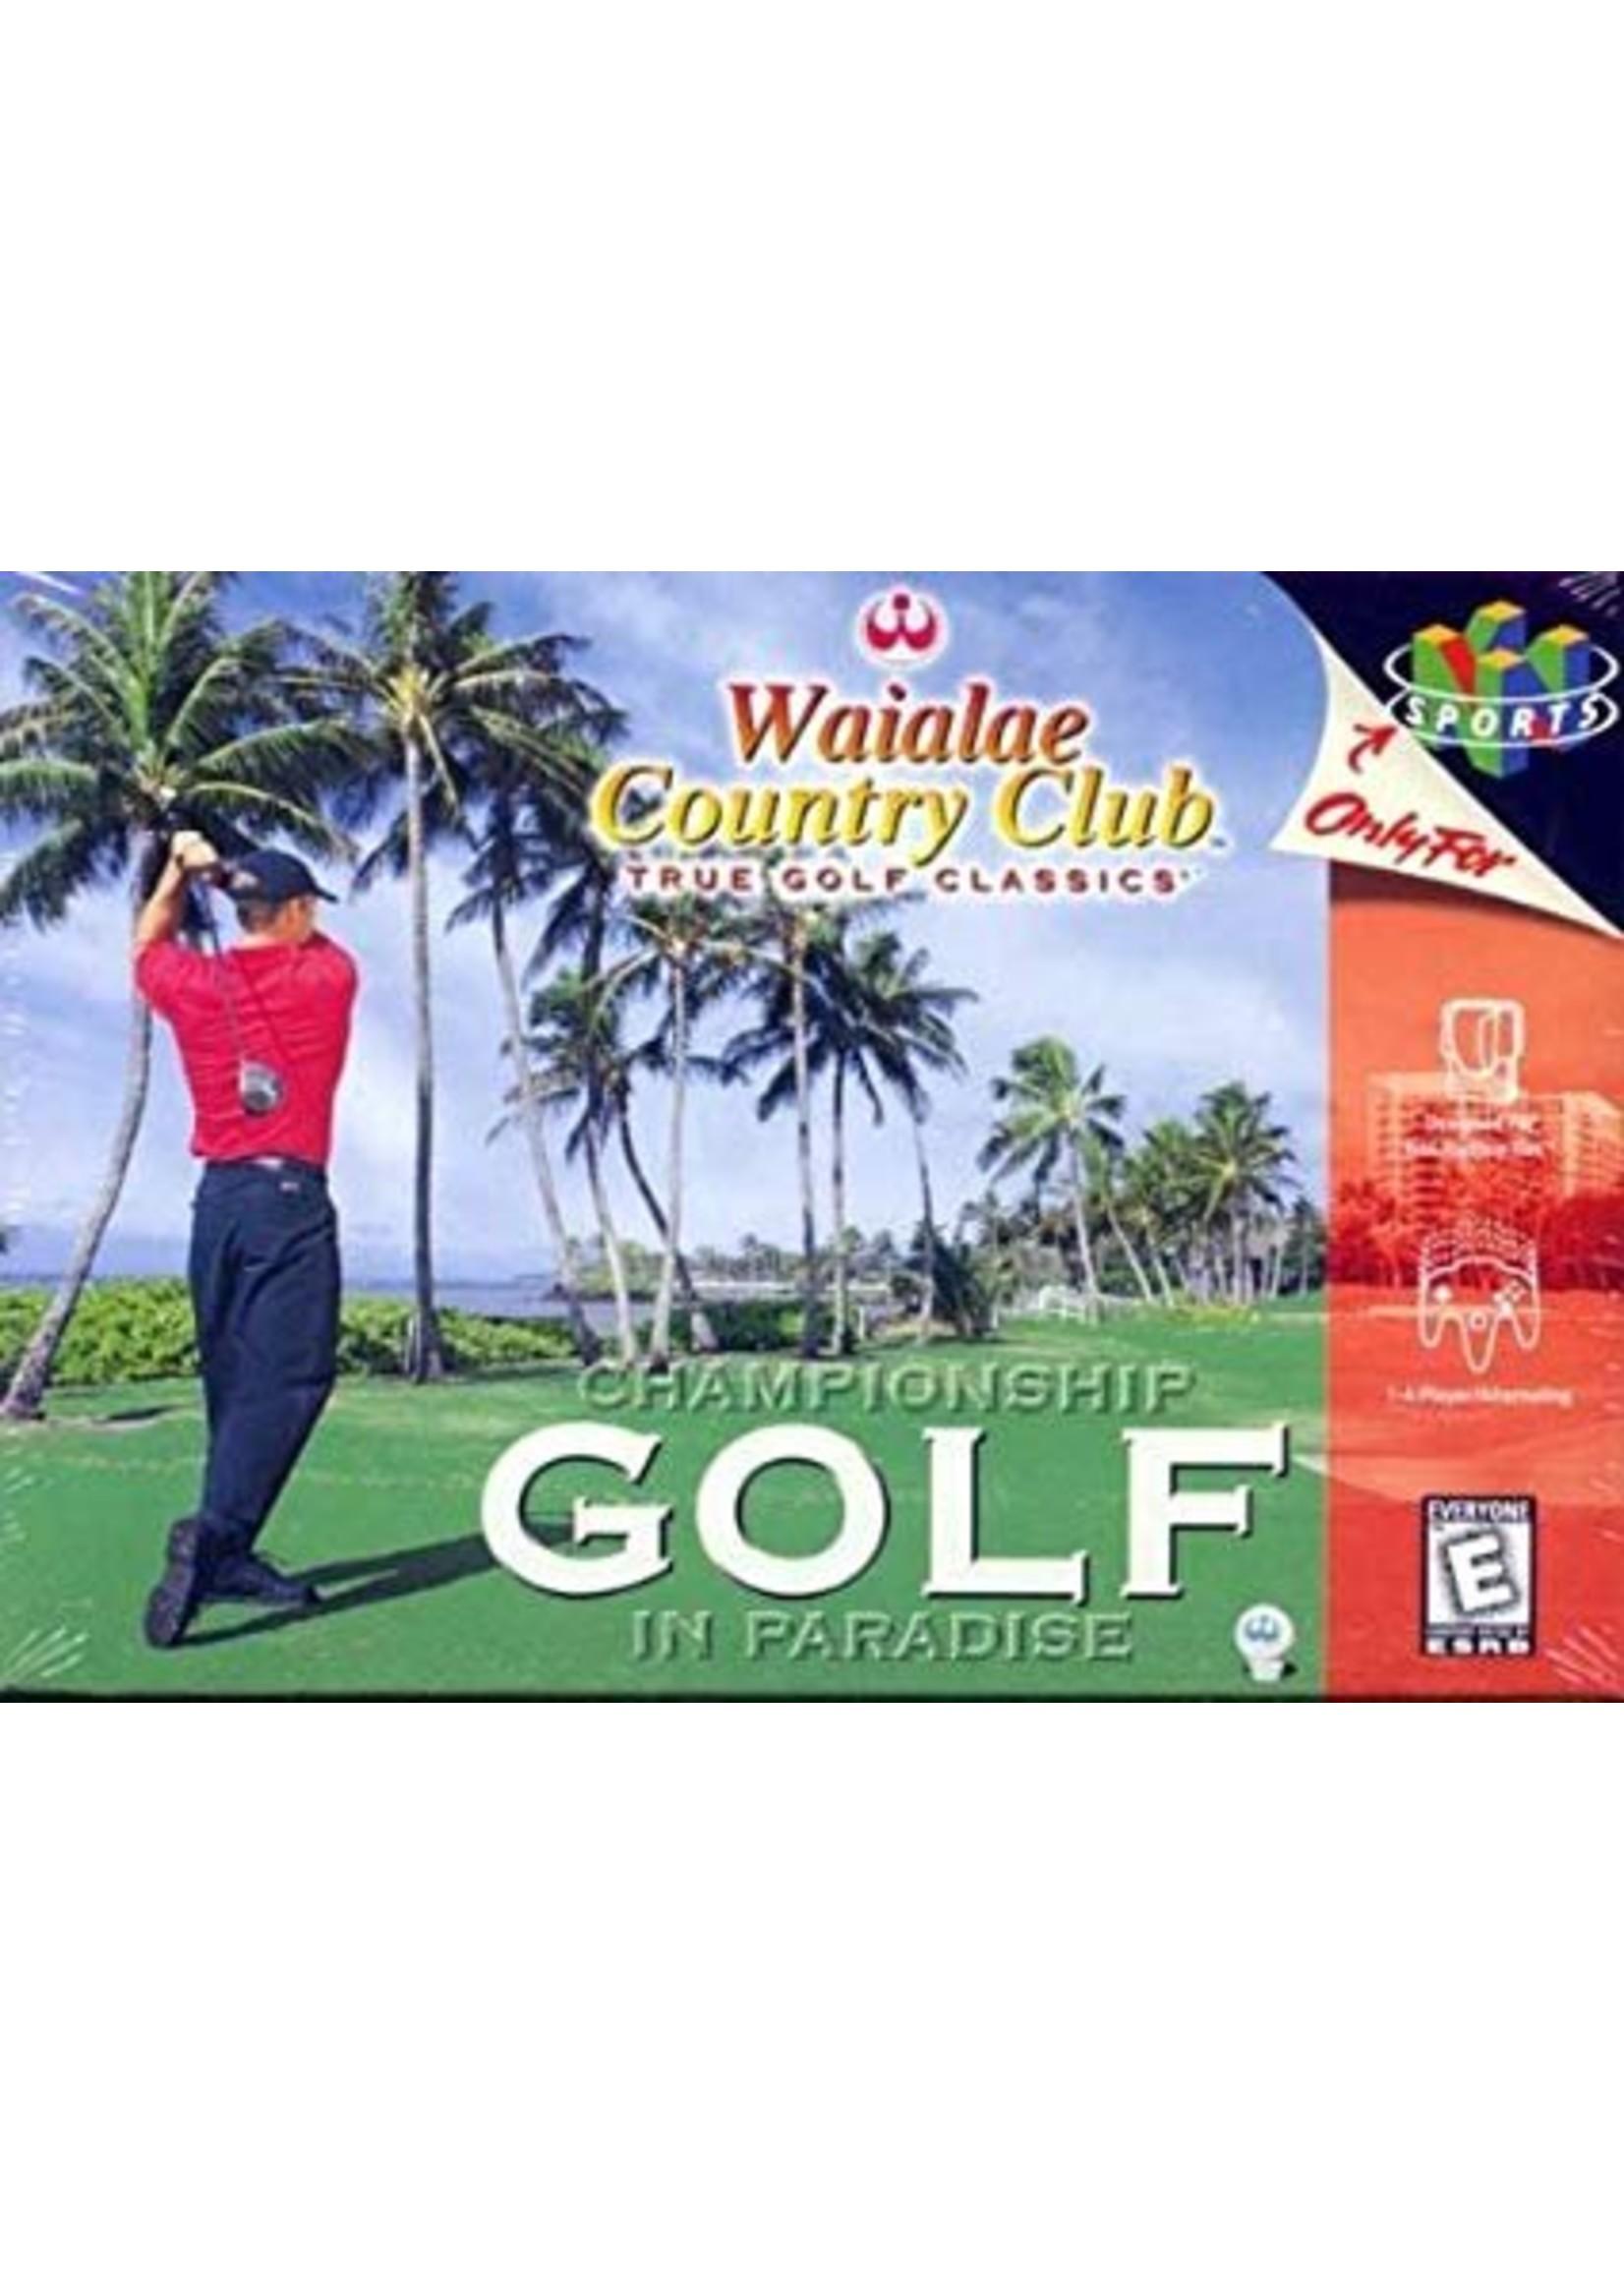 Waialae Country Club - N64 PrePlayed